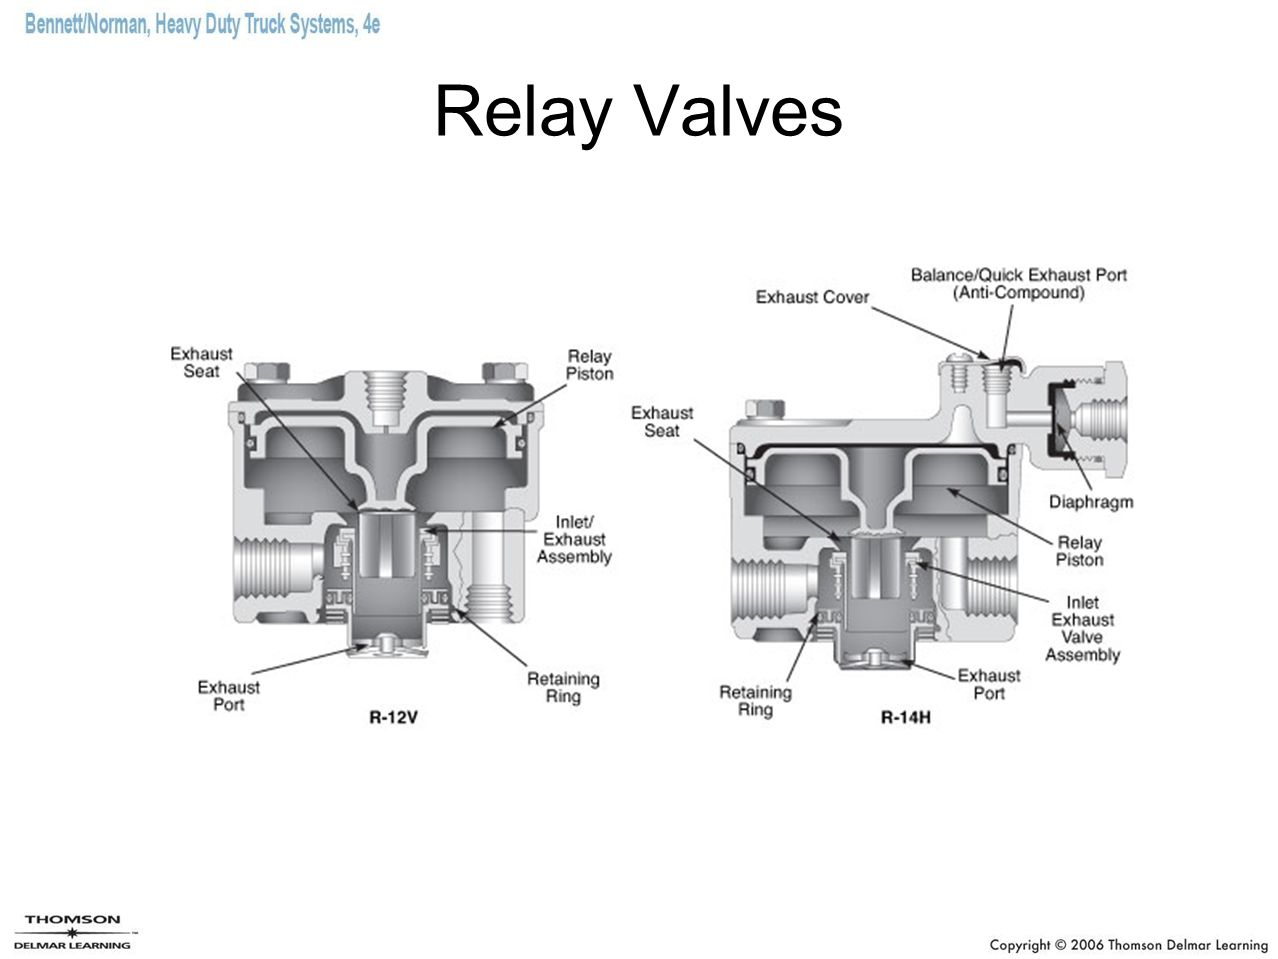 Relay Valves